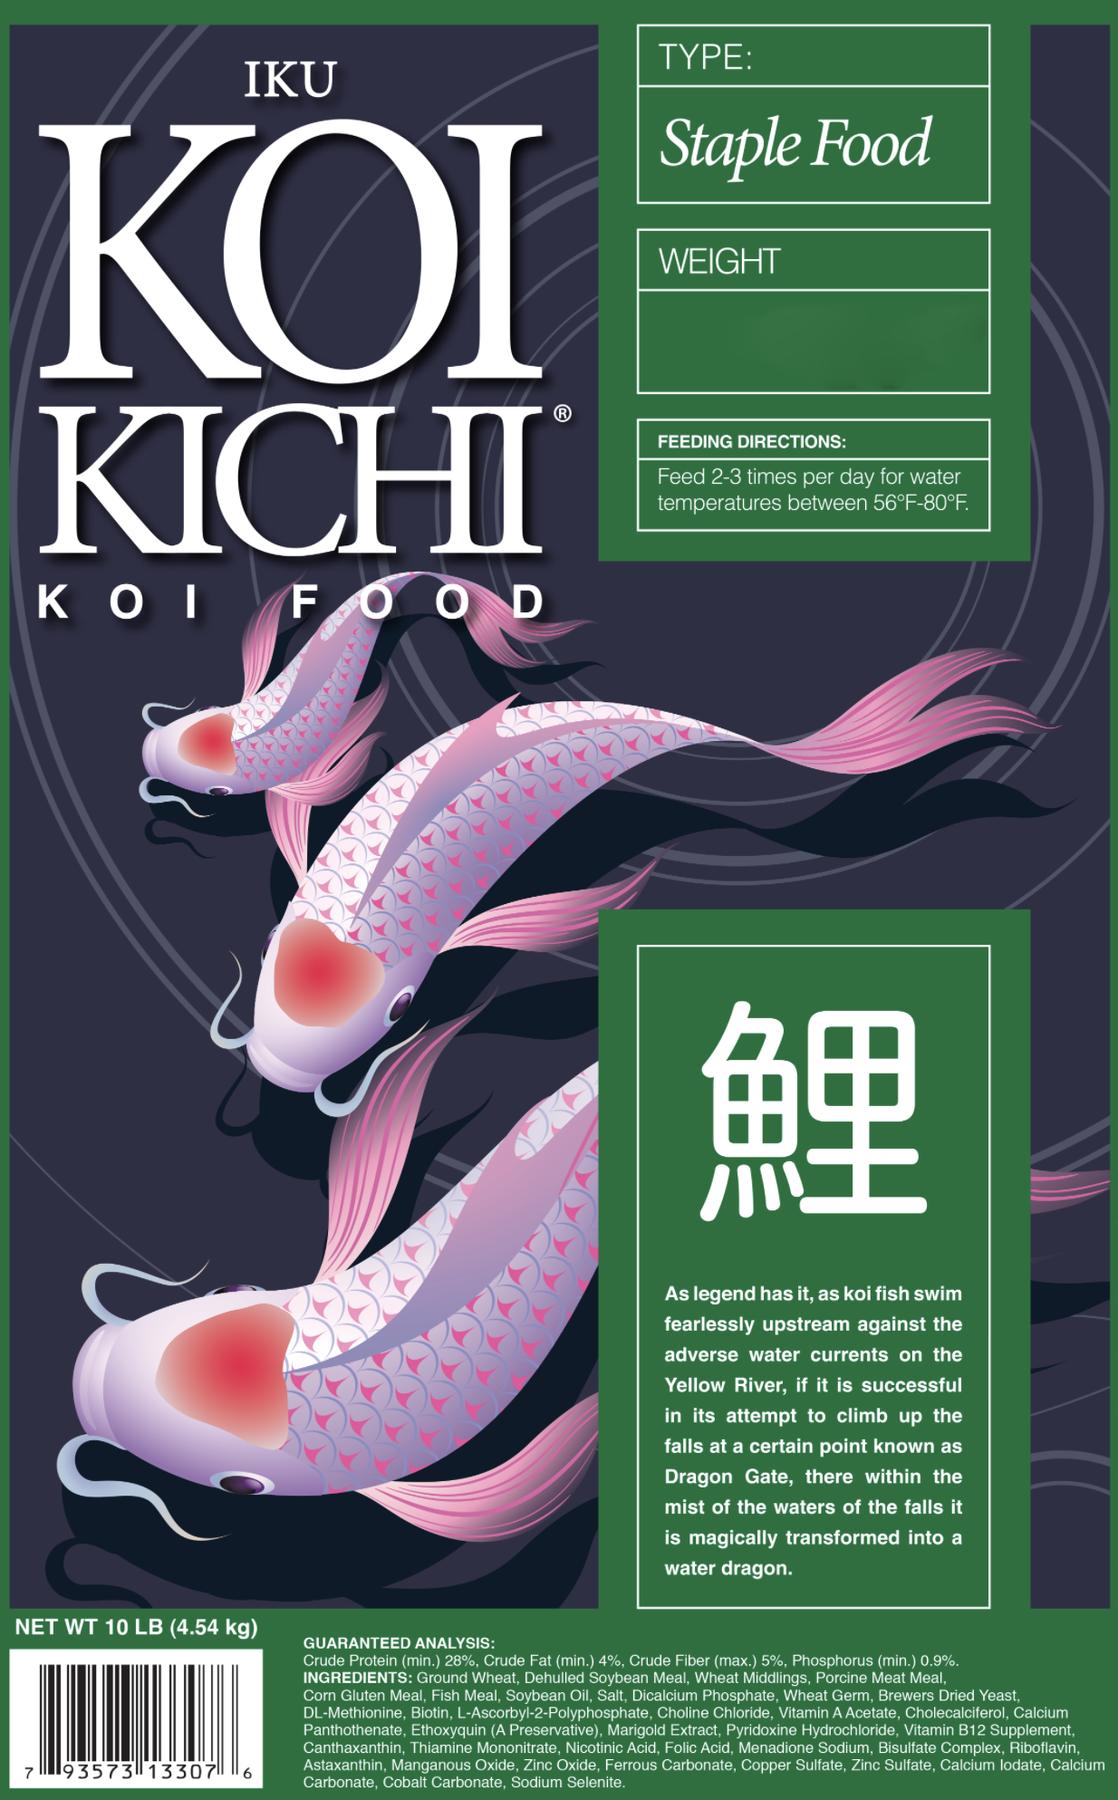 Iku Koi Kichi Staple Koi Fish Food - 10 lbs.